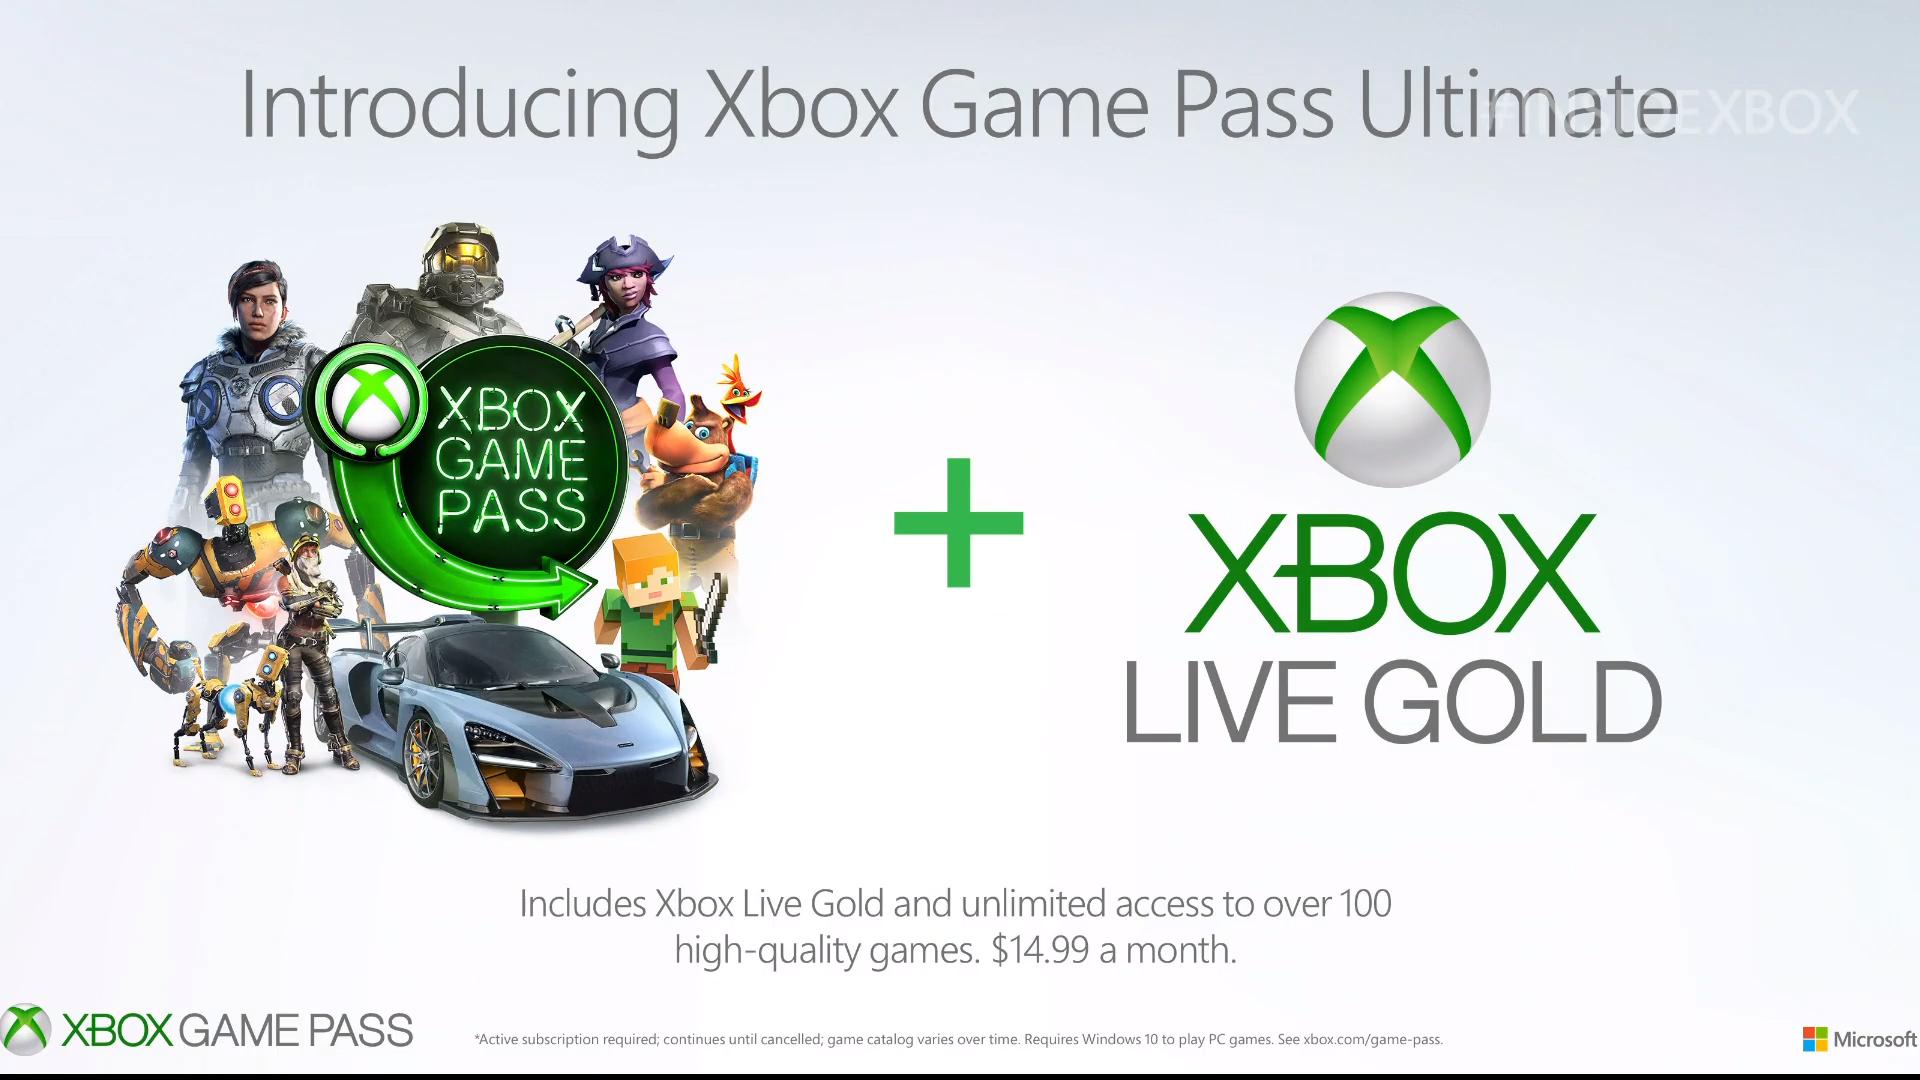 el-xbox-game-pass-ultimate-ya-fue-confirmado-por-microsoft-frikigamers.com